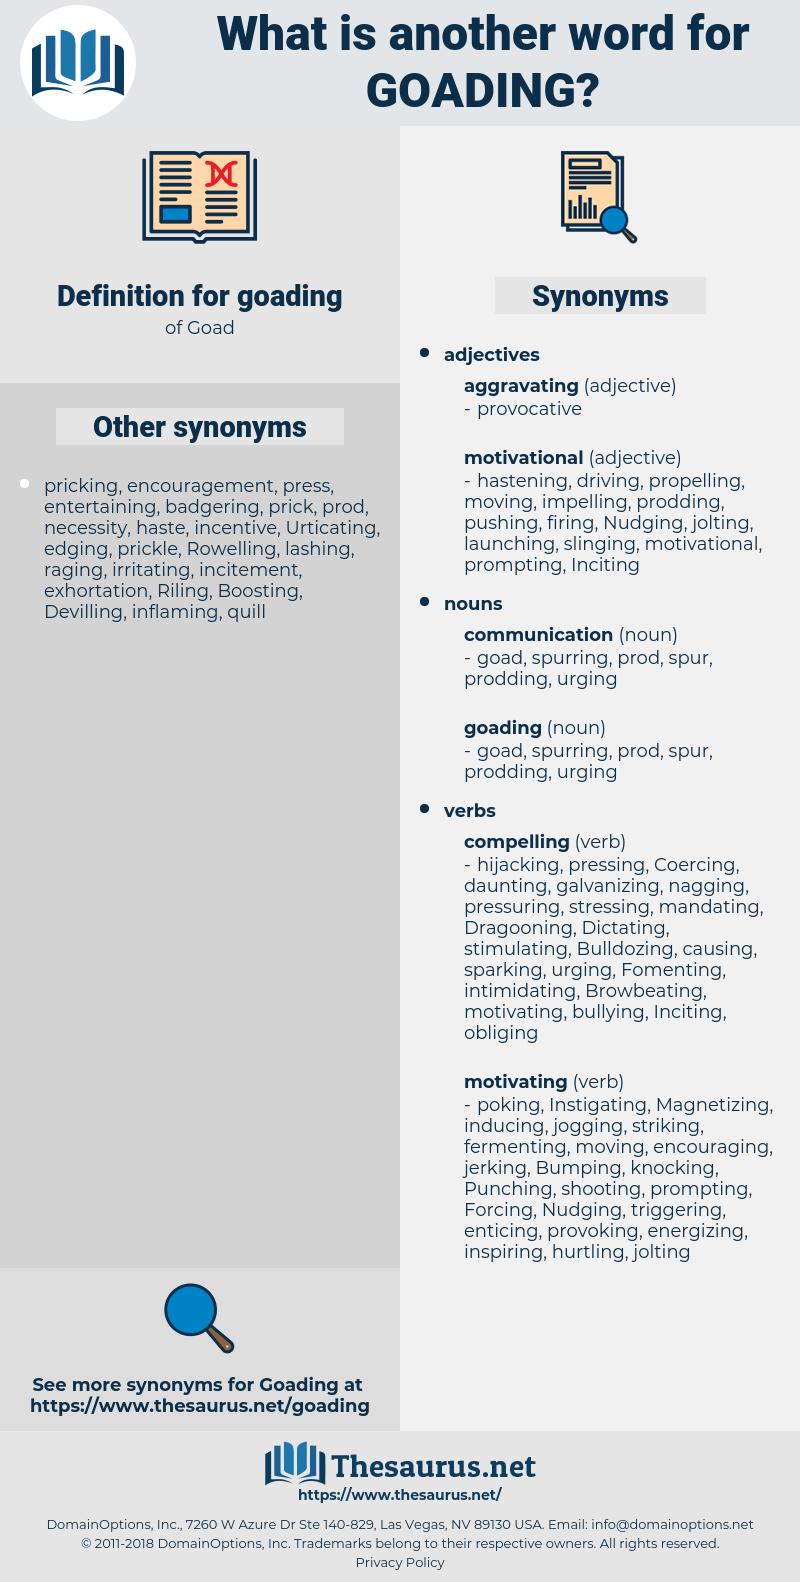 goading, synonym goading, another word for goading, words like goading, thesaurus goading